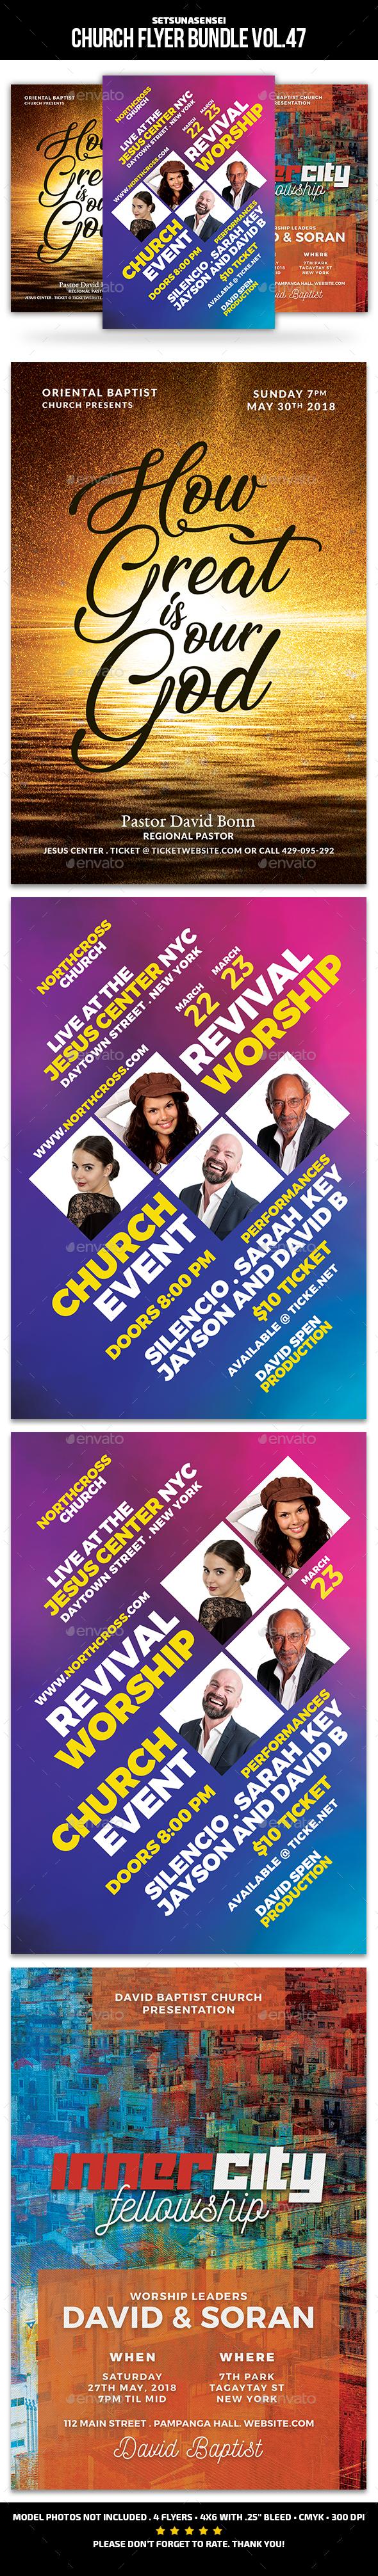 Church Flyer Bundle Vol. 47 - Church Flyers